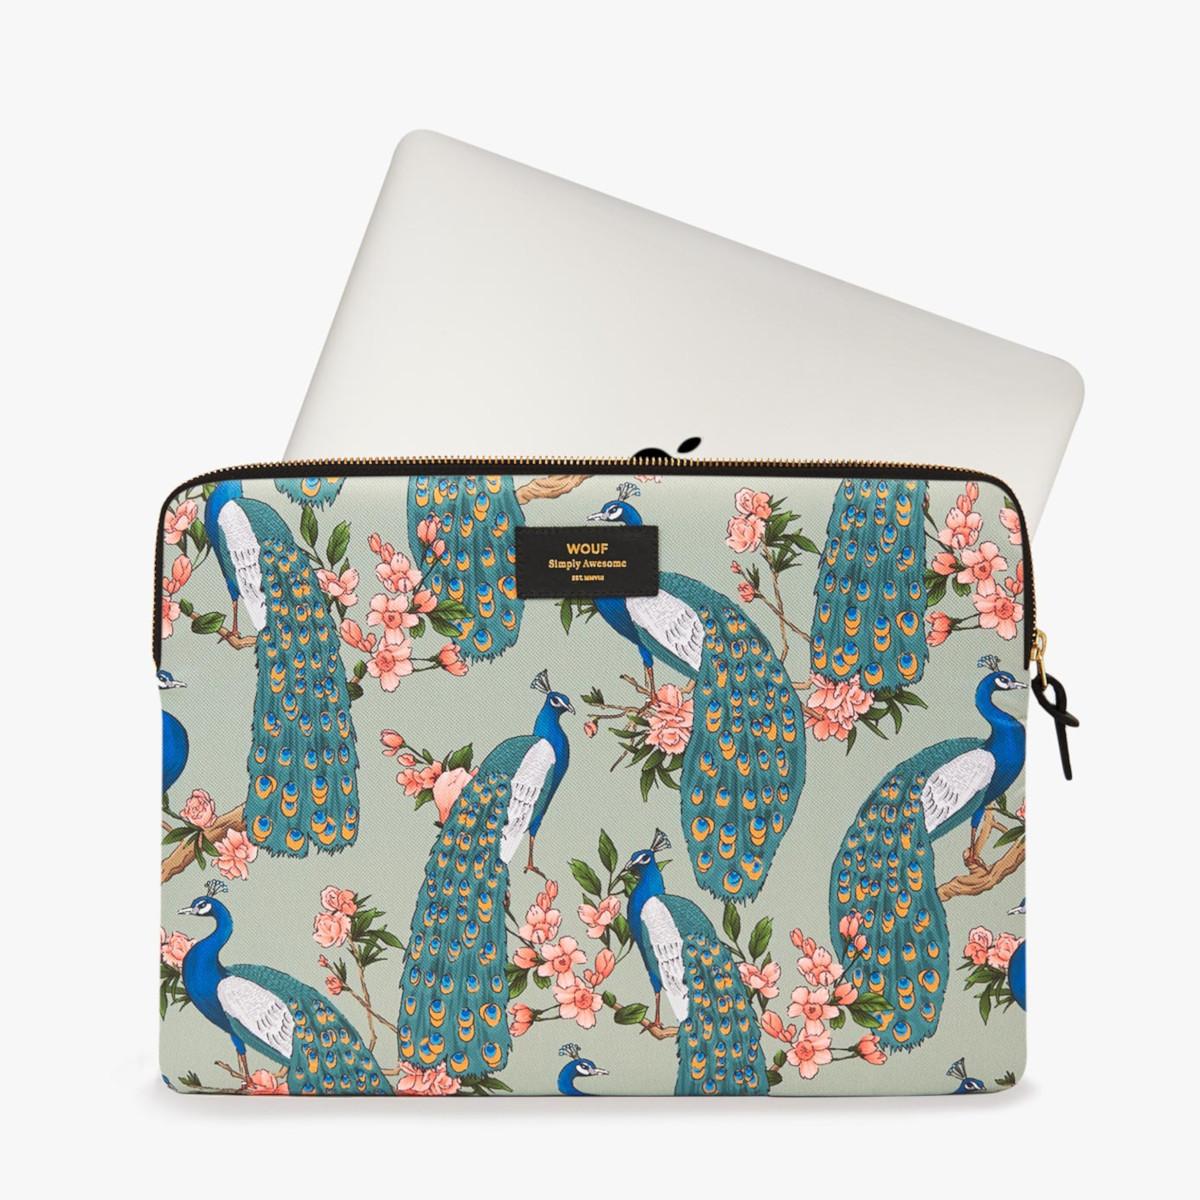 Elegancki pokrowiec na laptopa Royal Forest 15 Wouf